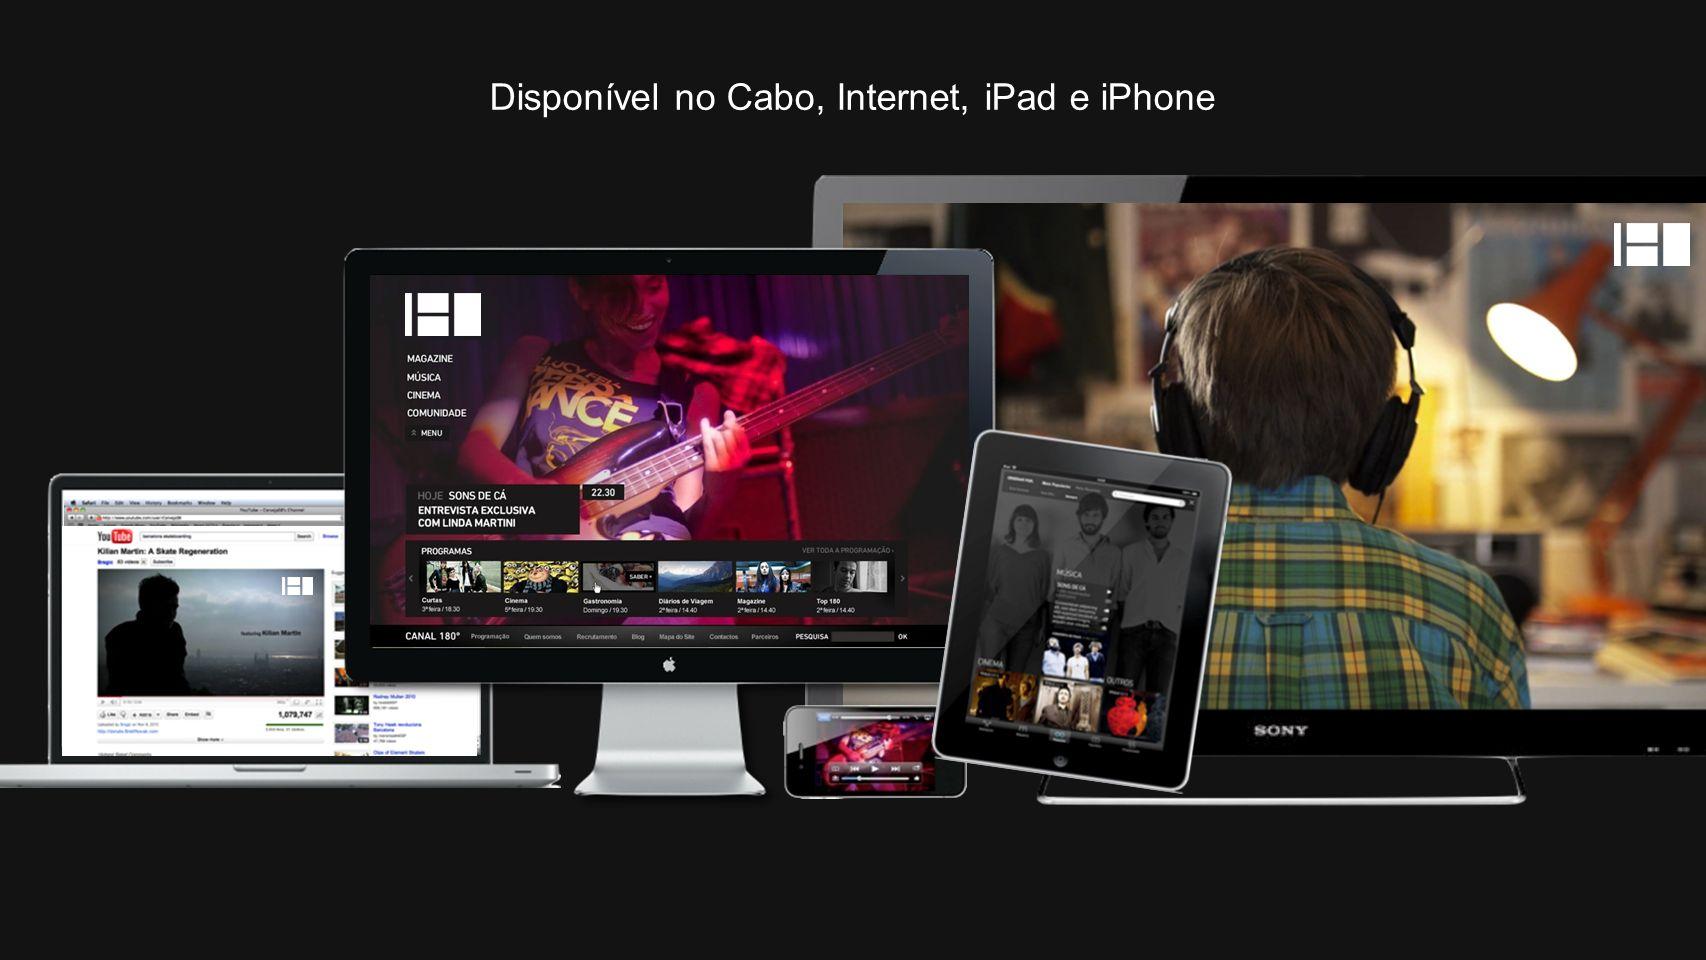 Disponível no Cabo, Internet, iPad e iPhone